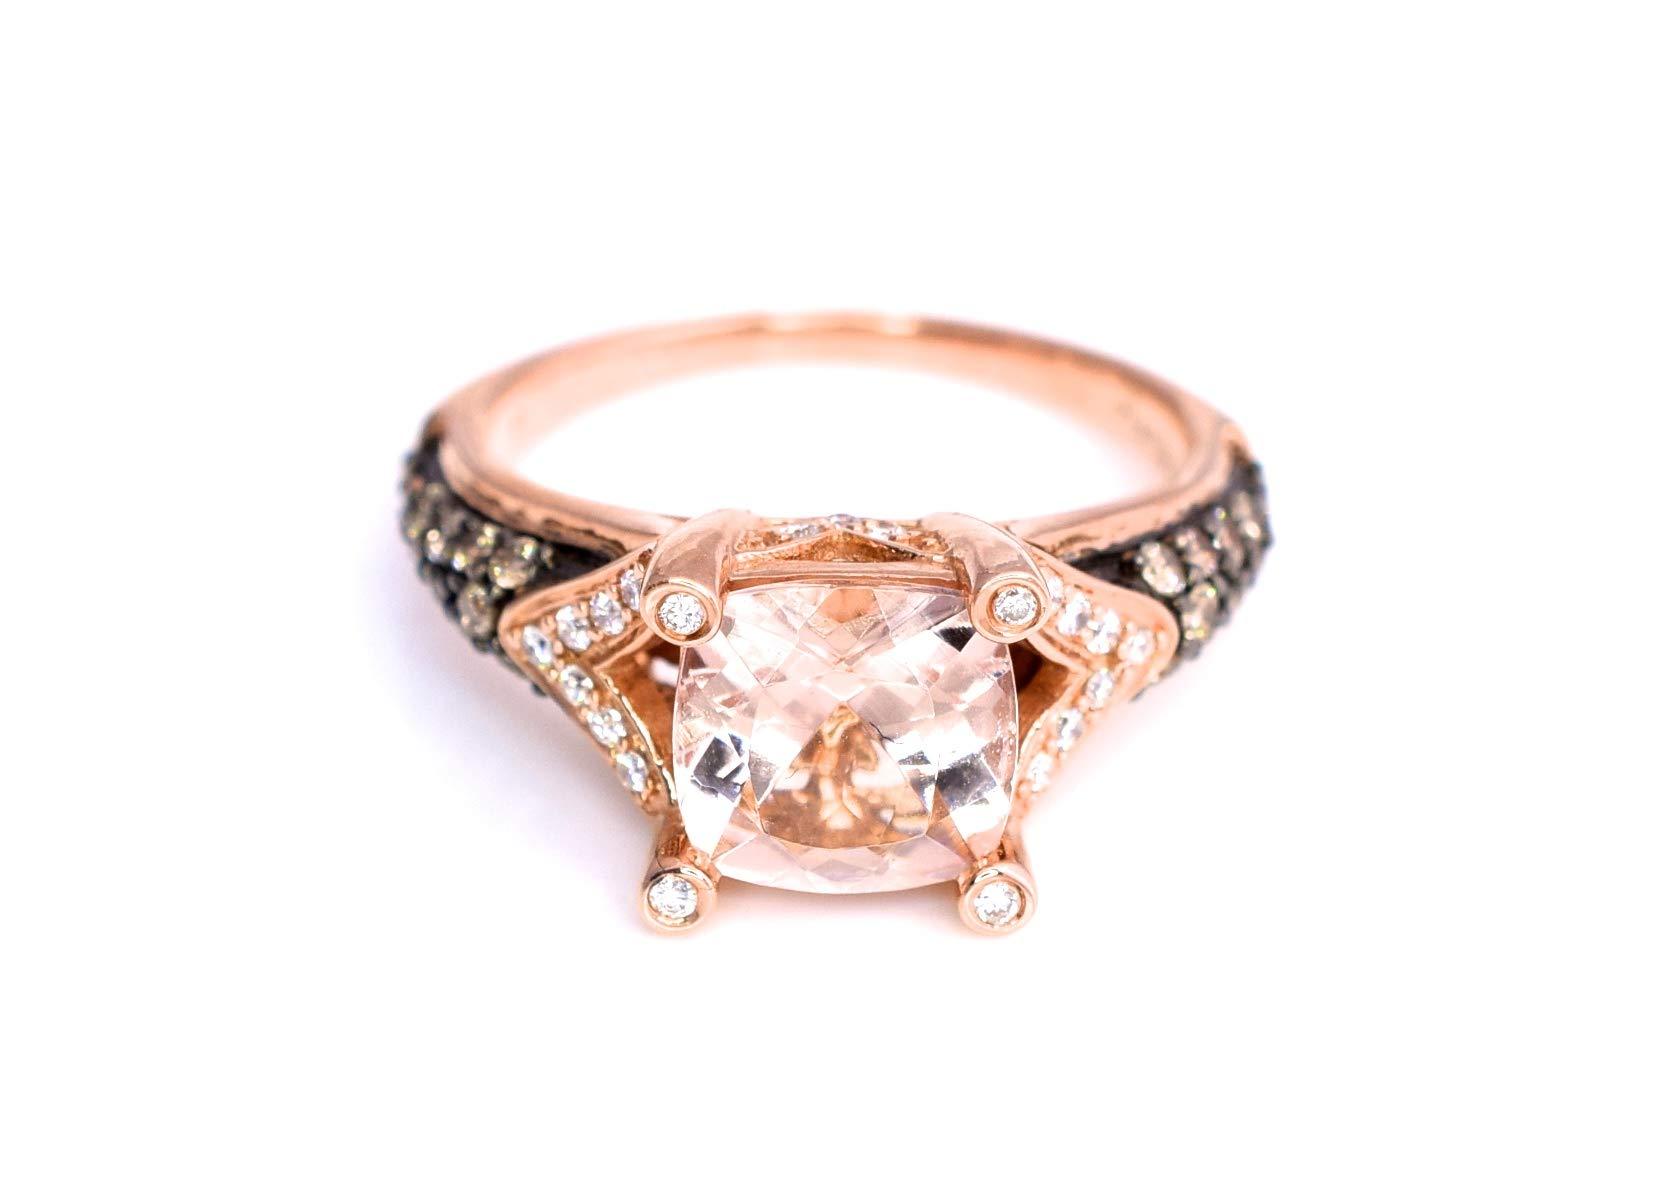 LeVian Ring Peach Morganite Chocolate and Vanilla Diamonds 2 cttw 14K Rose Gold New